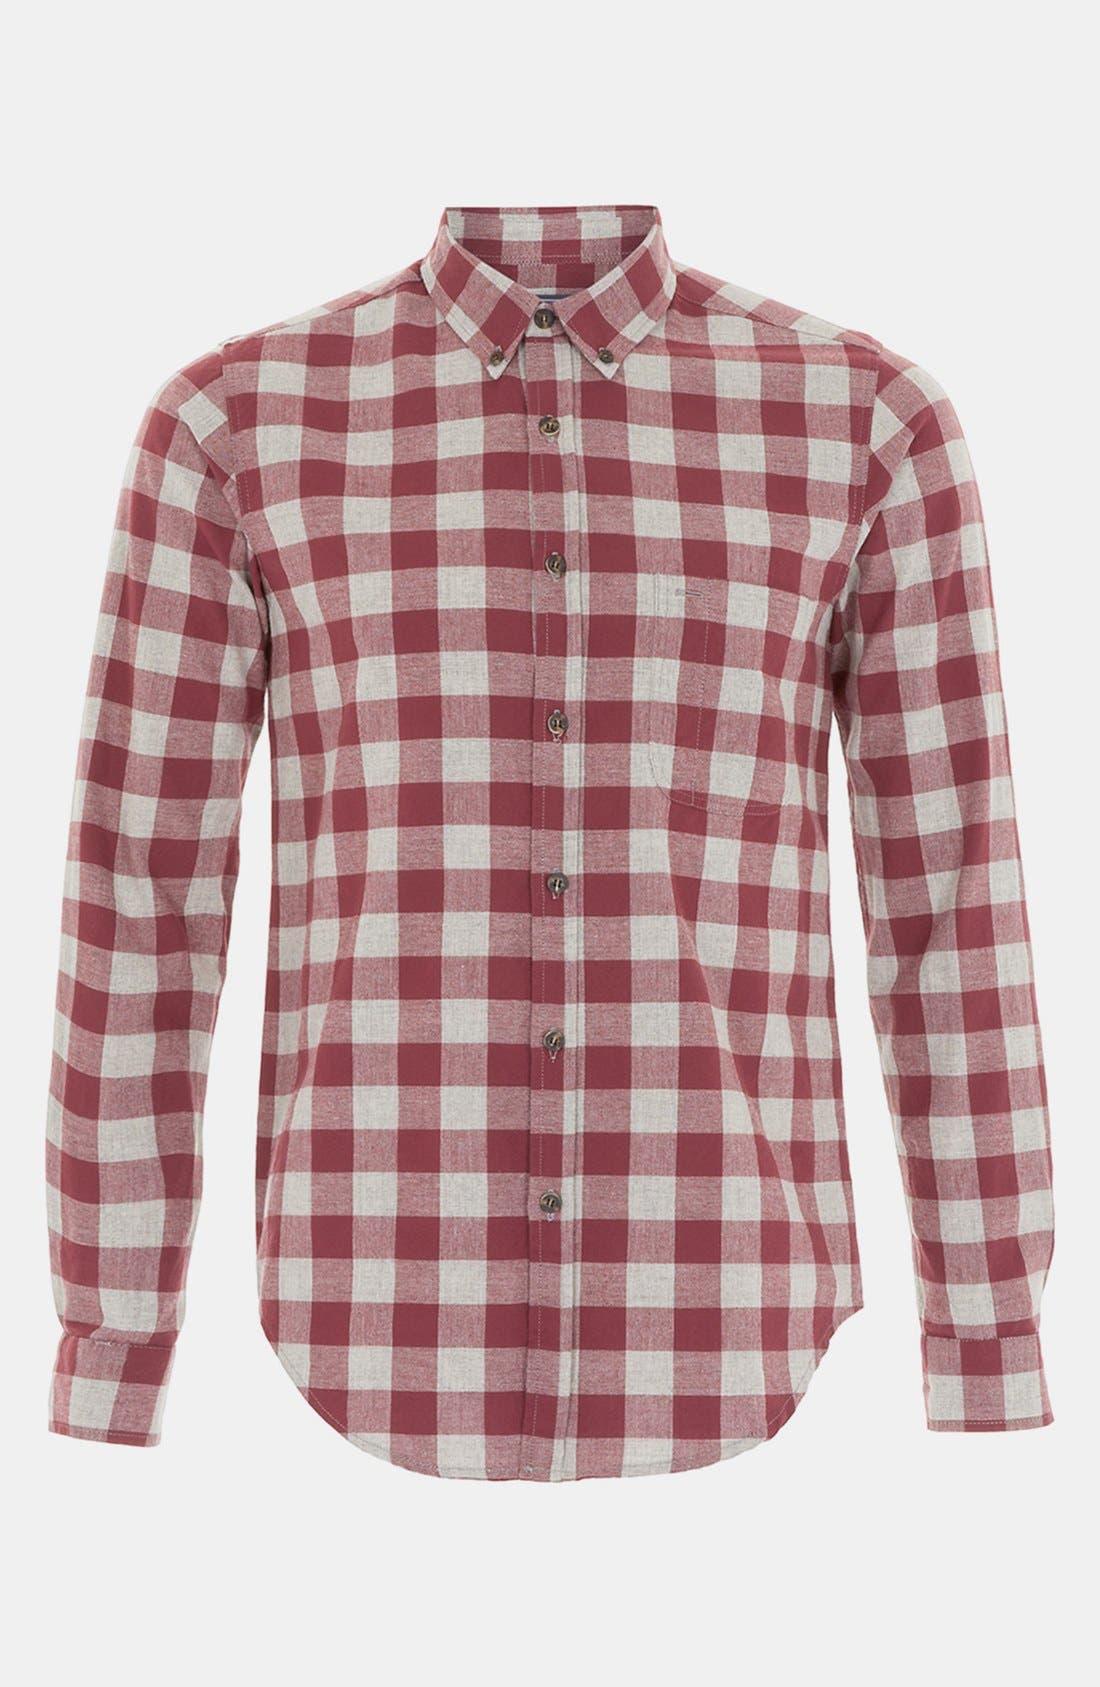 Main Image - Topman Check Woven Shirt